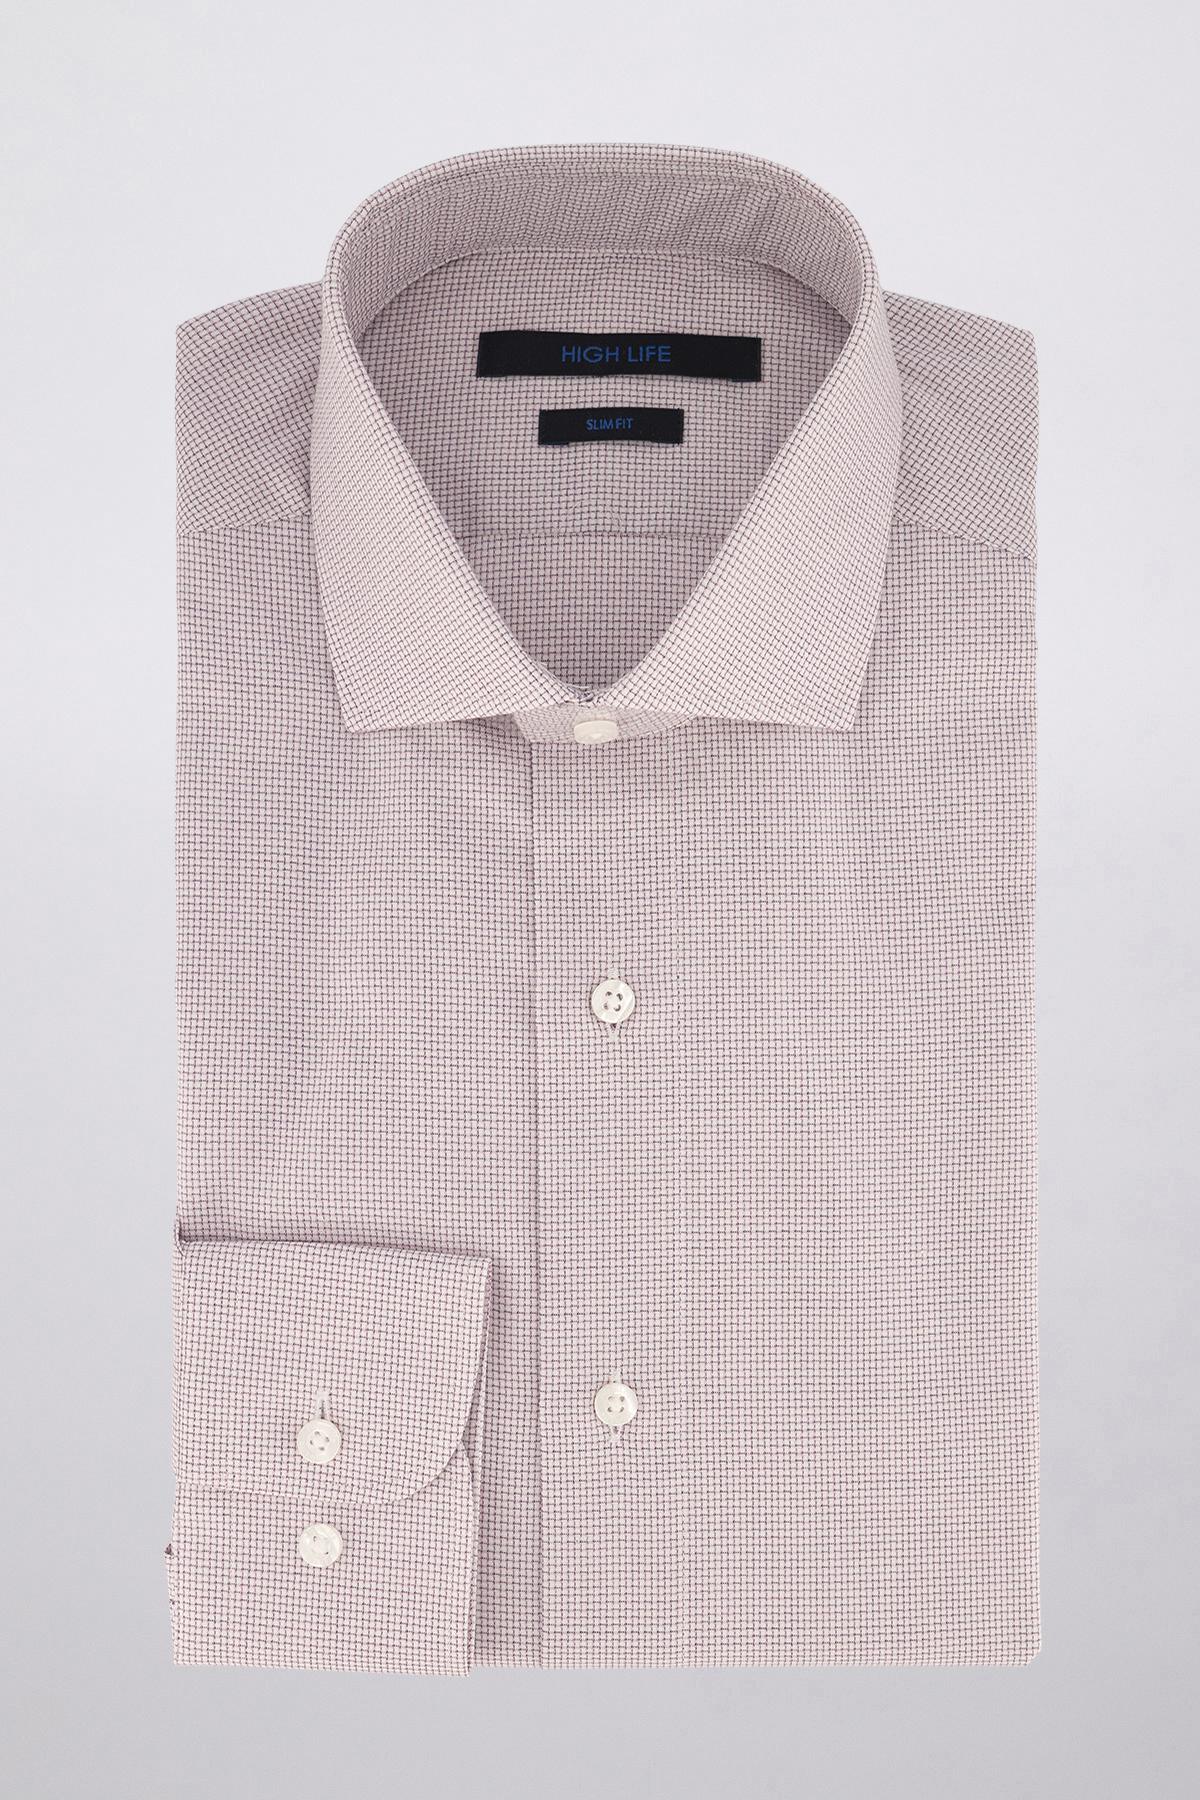 Camisa Vestir marca HIGH LIFE color Rosa